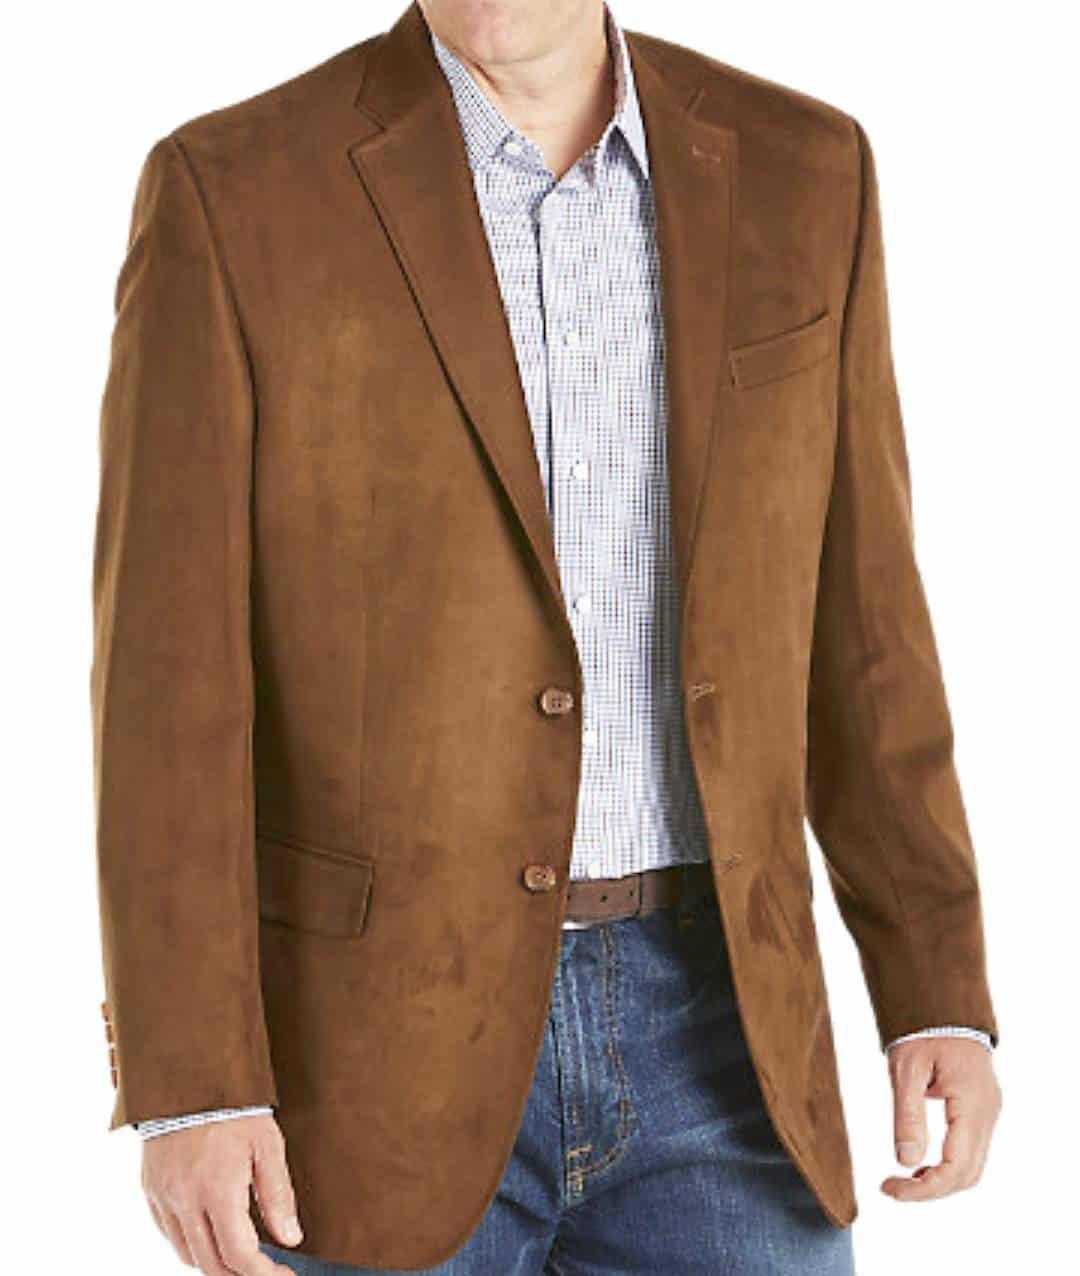 Blazer trends 2021: bold trends of blazer for men 2021, sport jacket 2021 and mens sport coats 2021